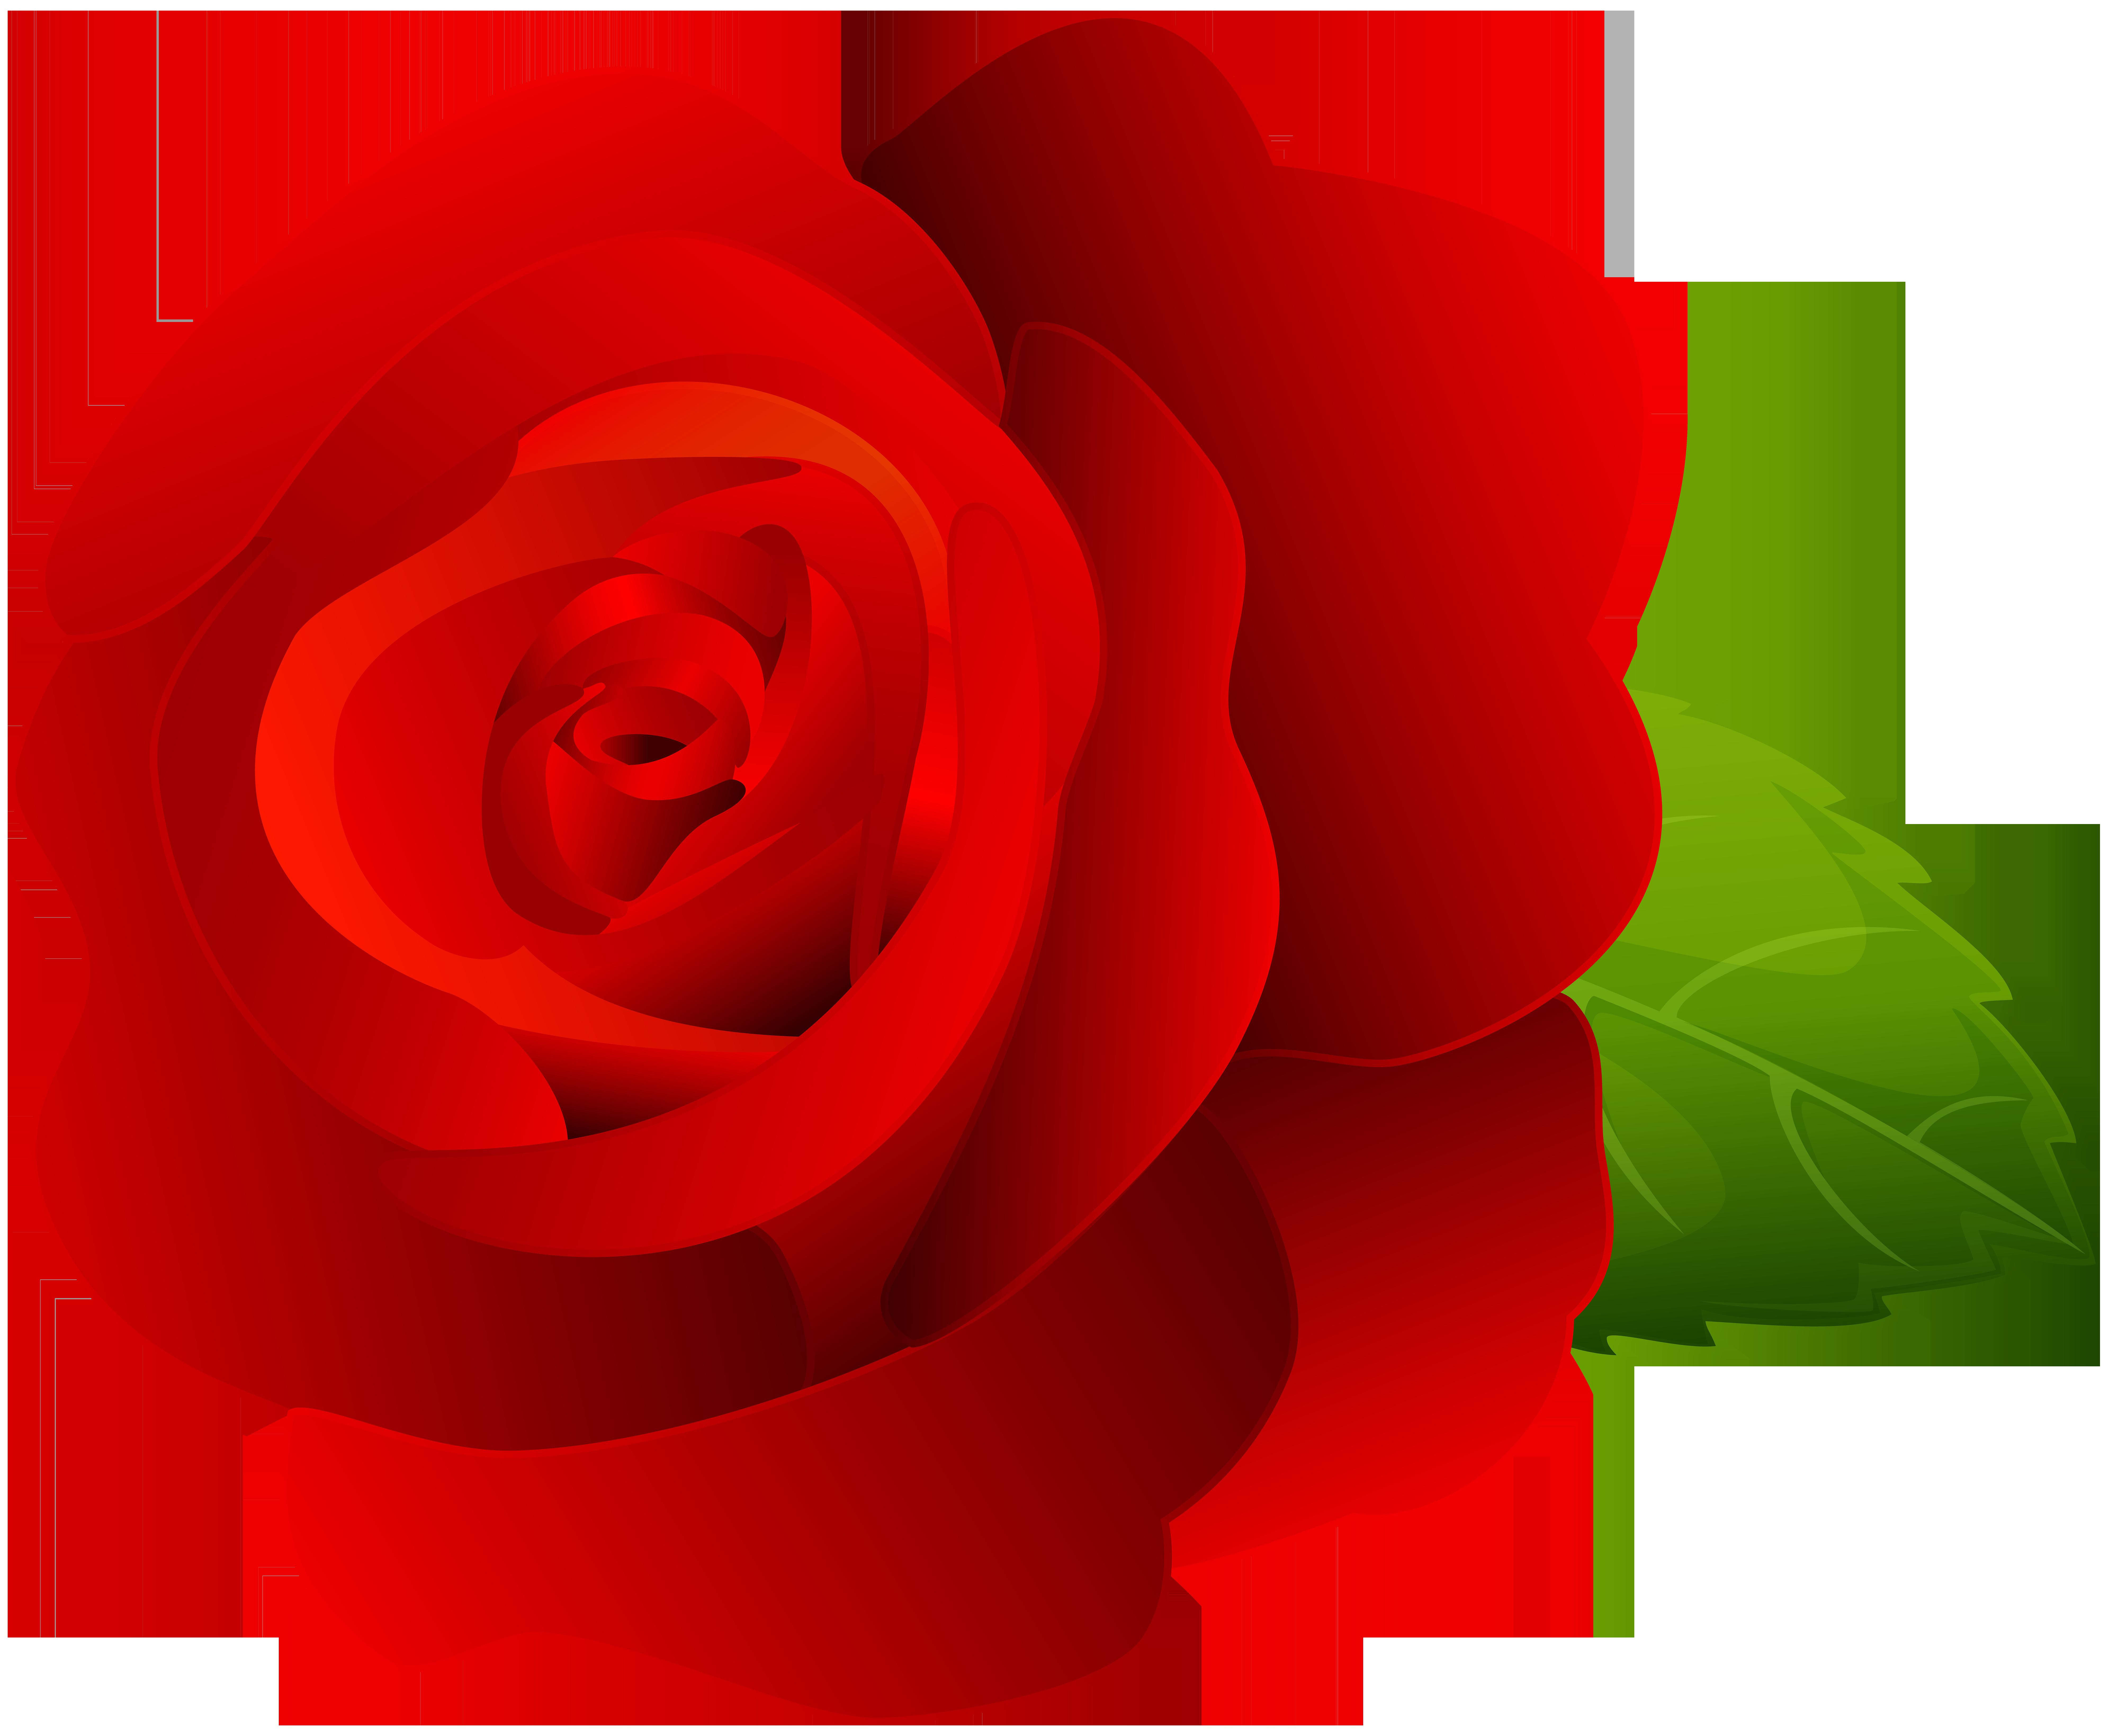 Rose Red Clip Art PNG Image.